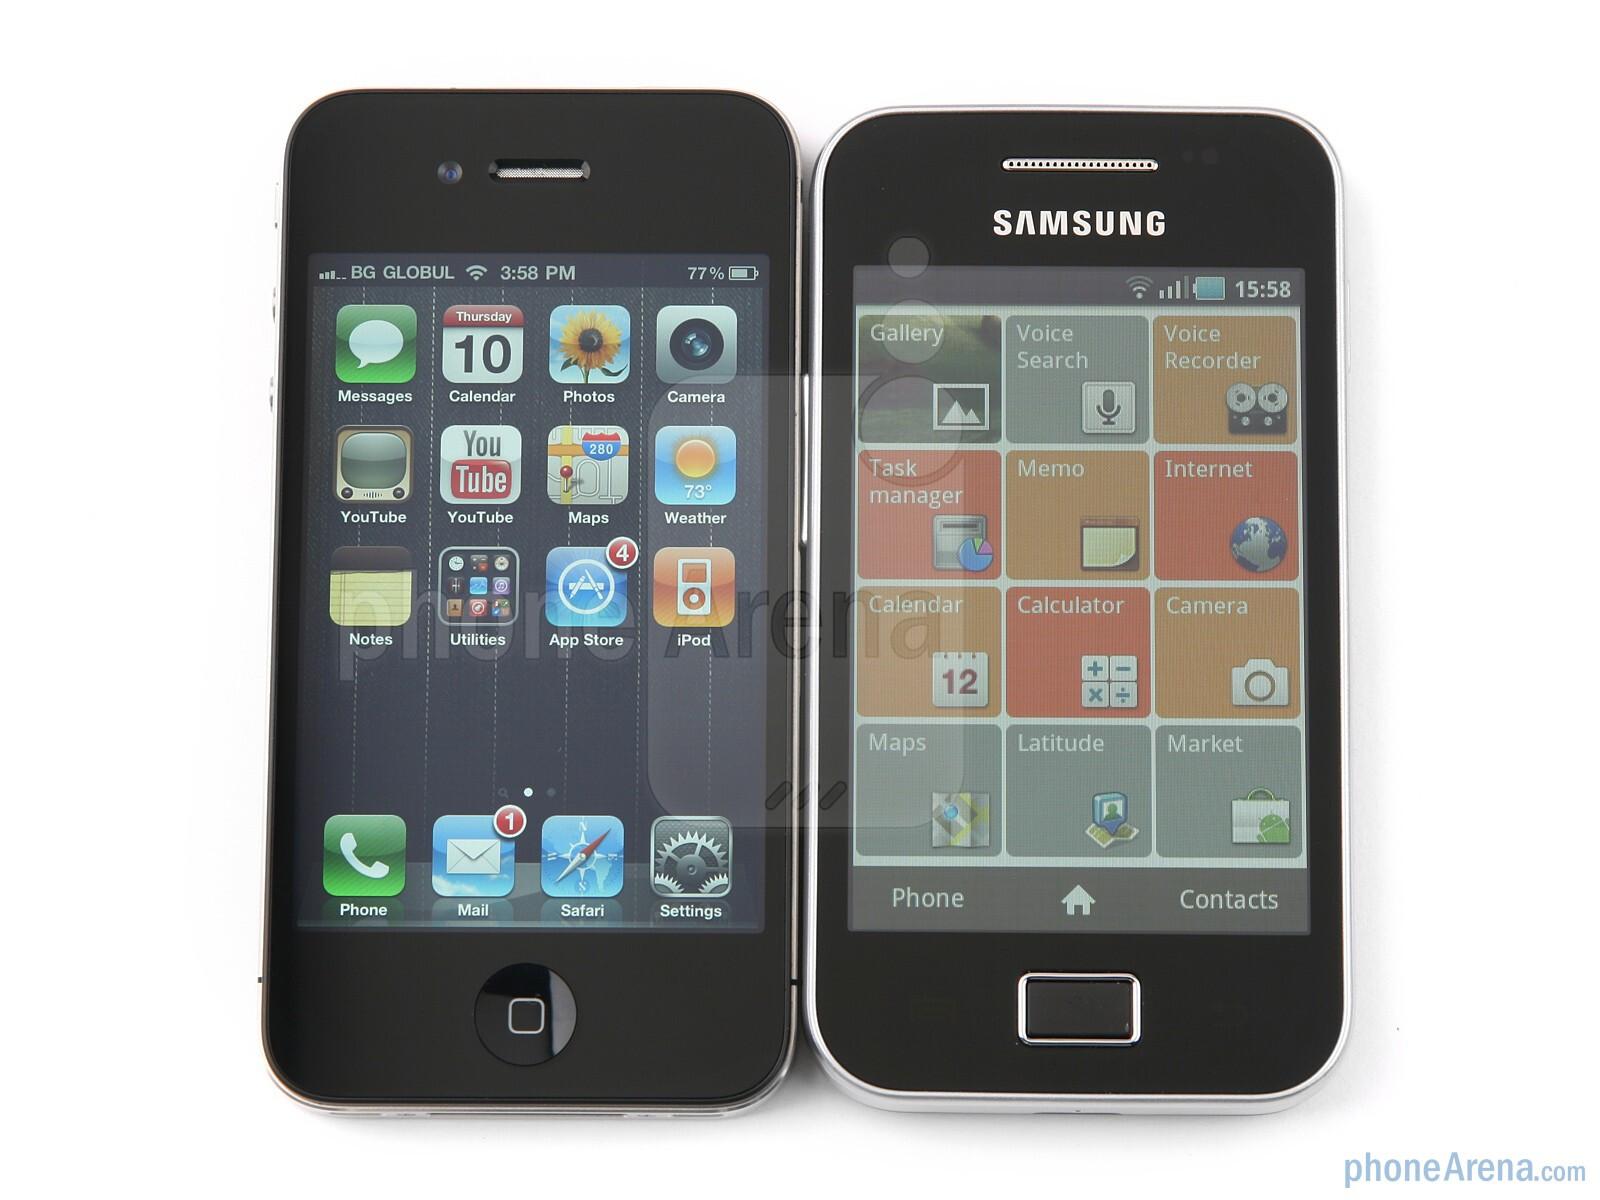 Samsung GALAXY Ace Preview - PhoneArena